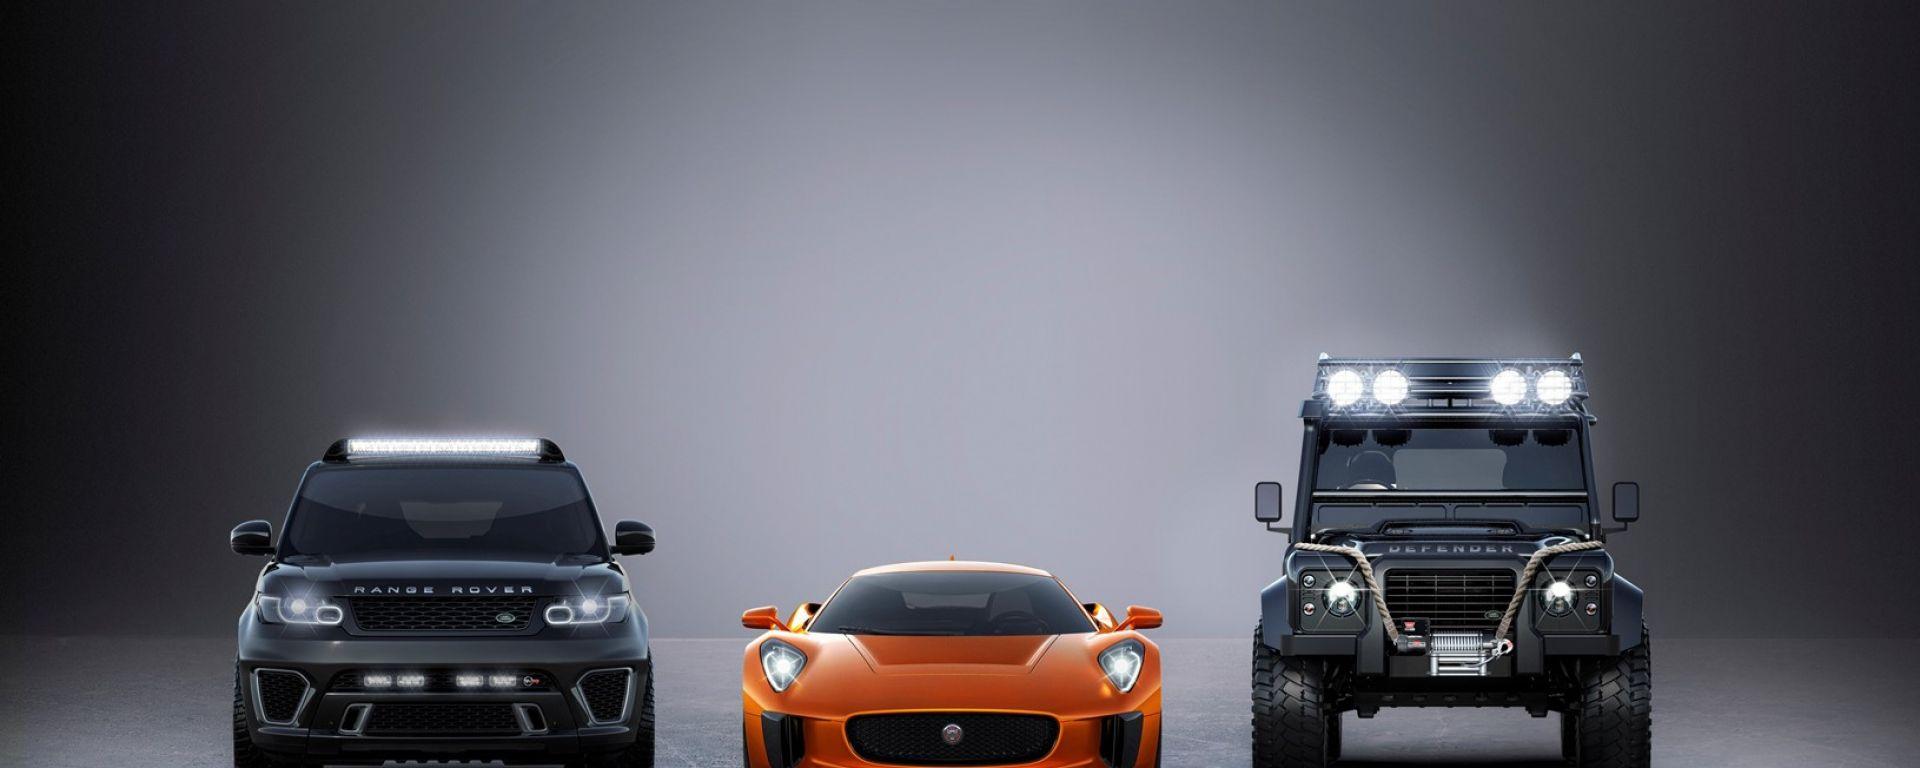 Bond guiderà Jaguar e Land Rover in Spectre